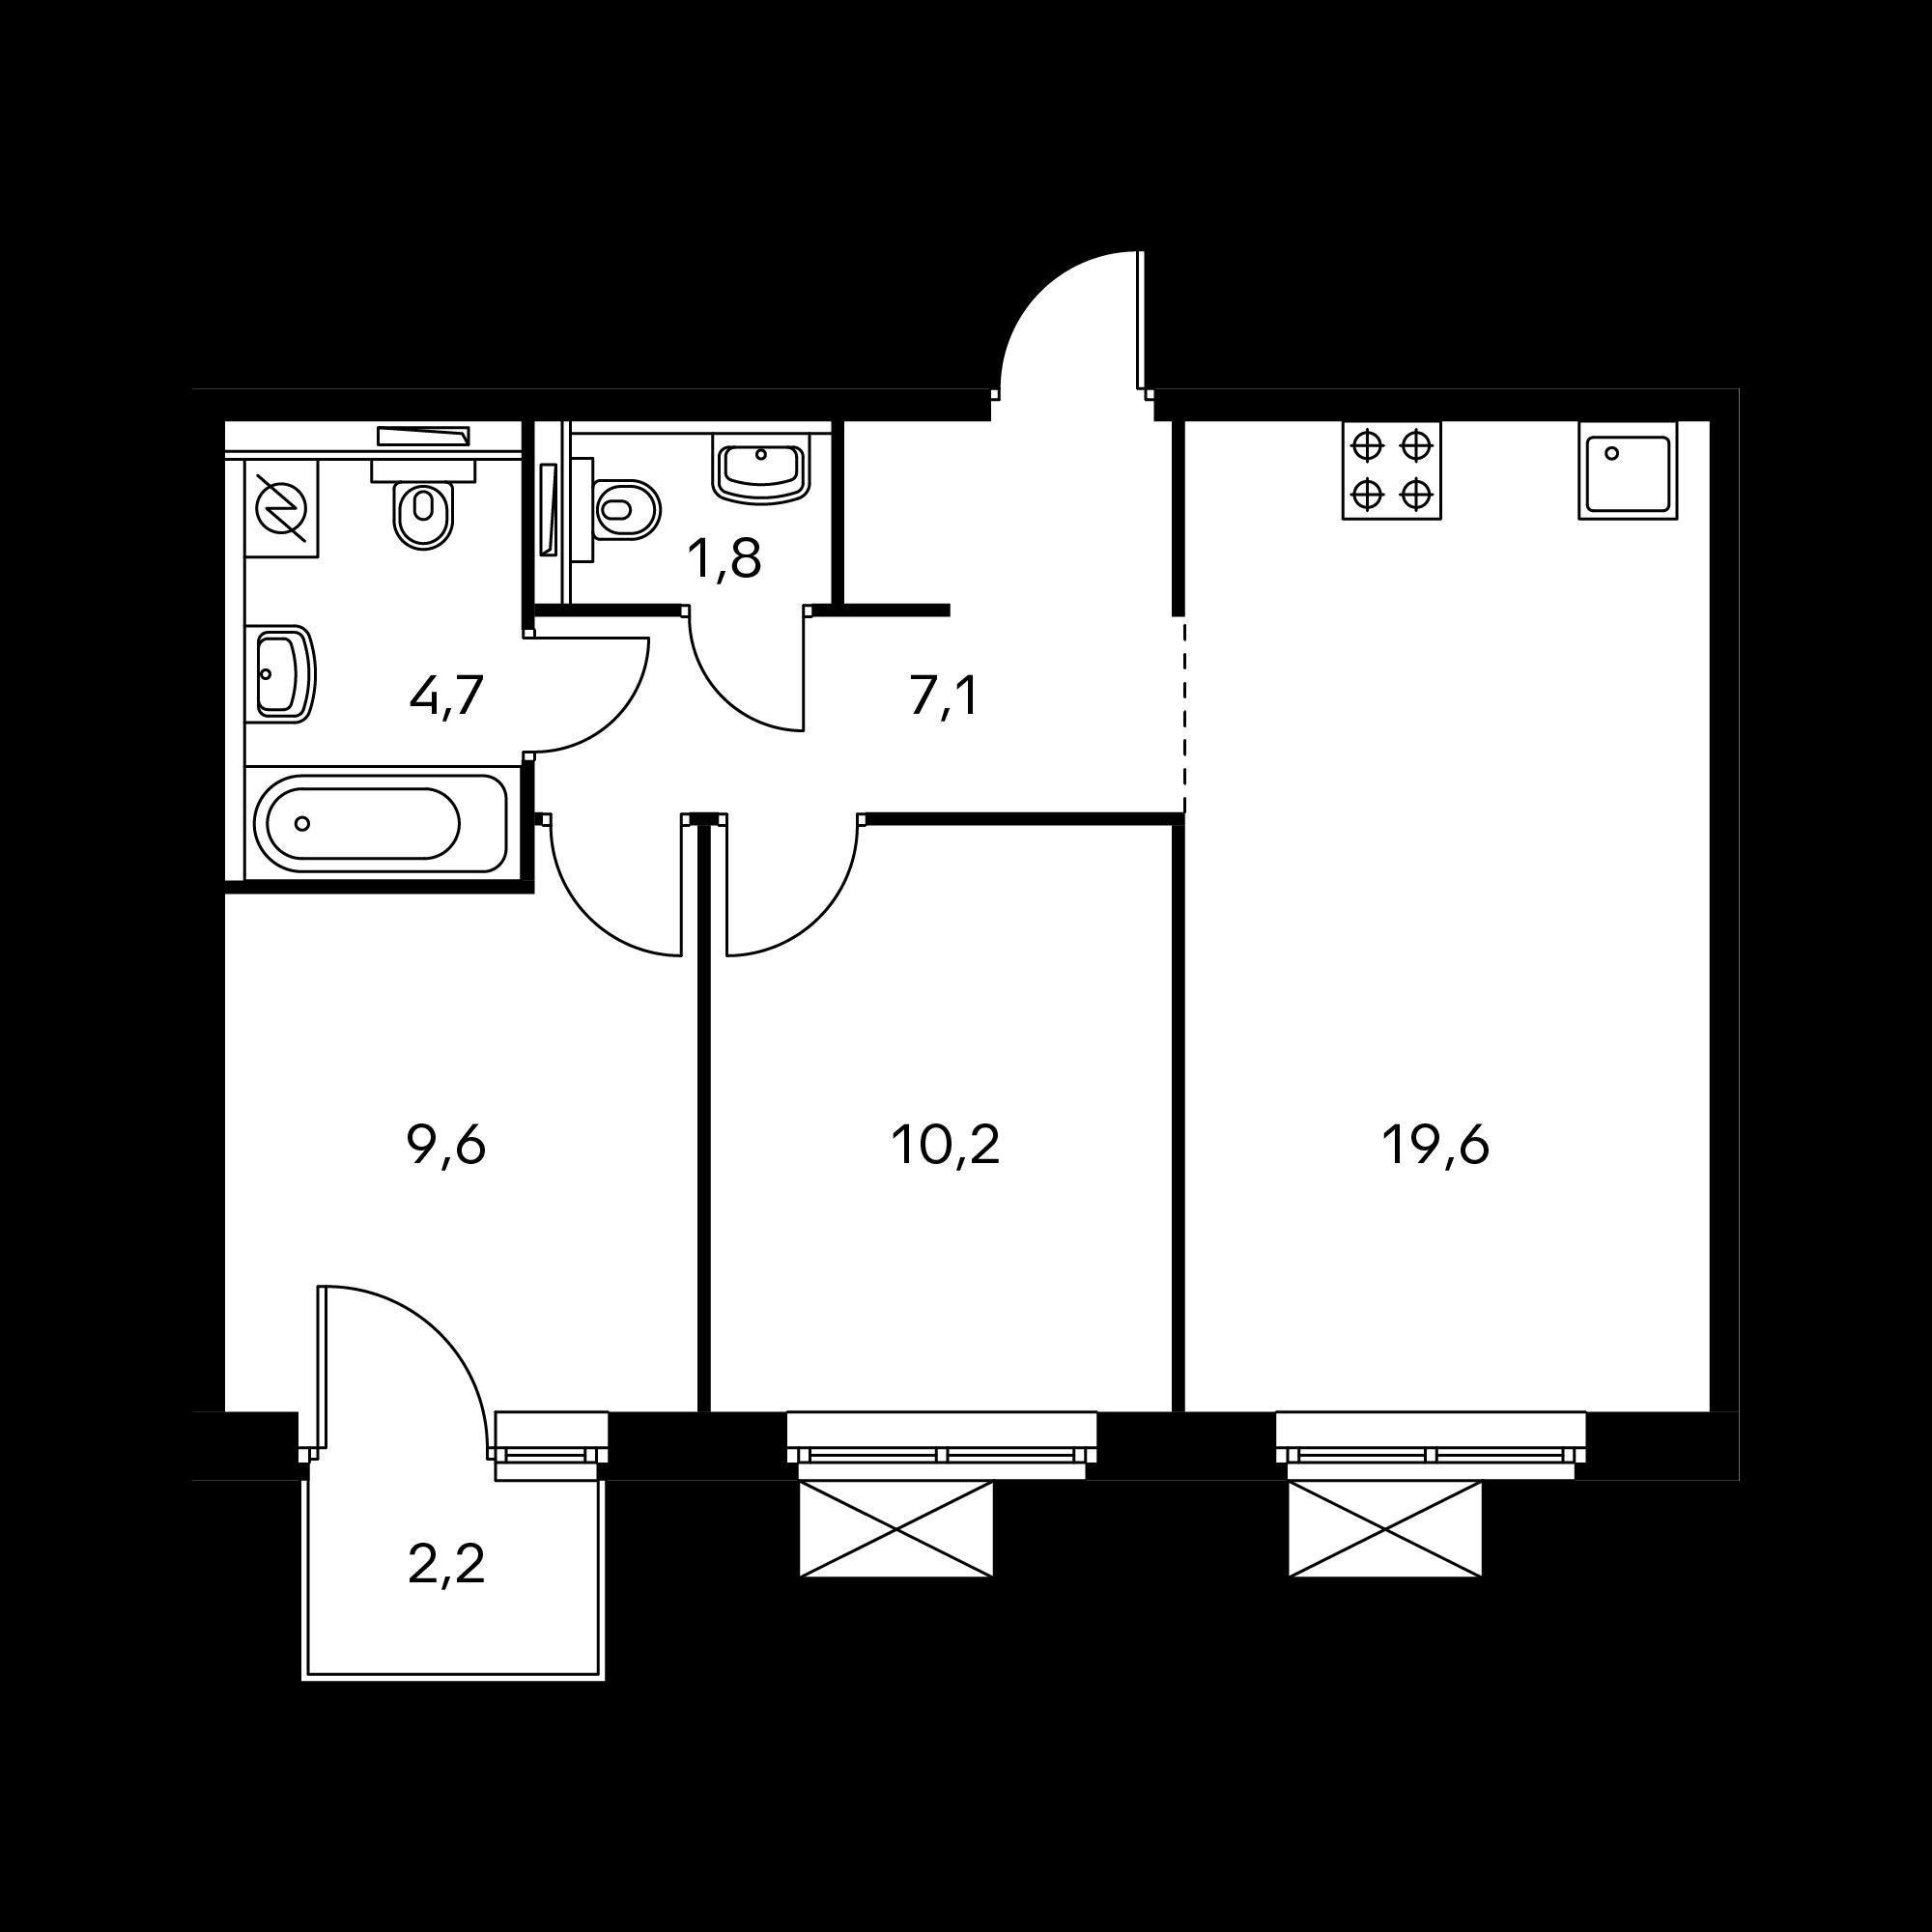 2ES9_9.3-1_B(2,2)